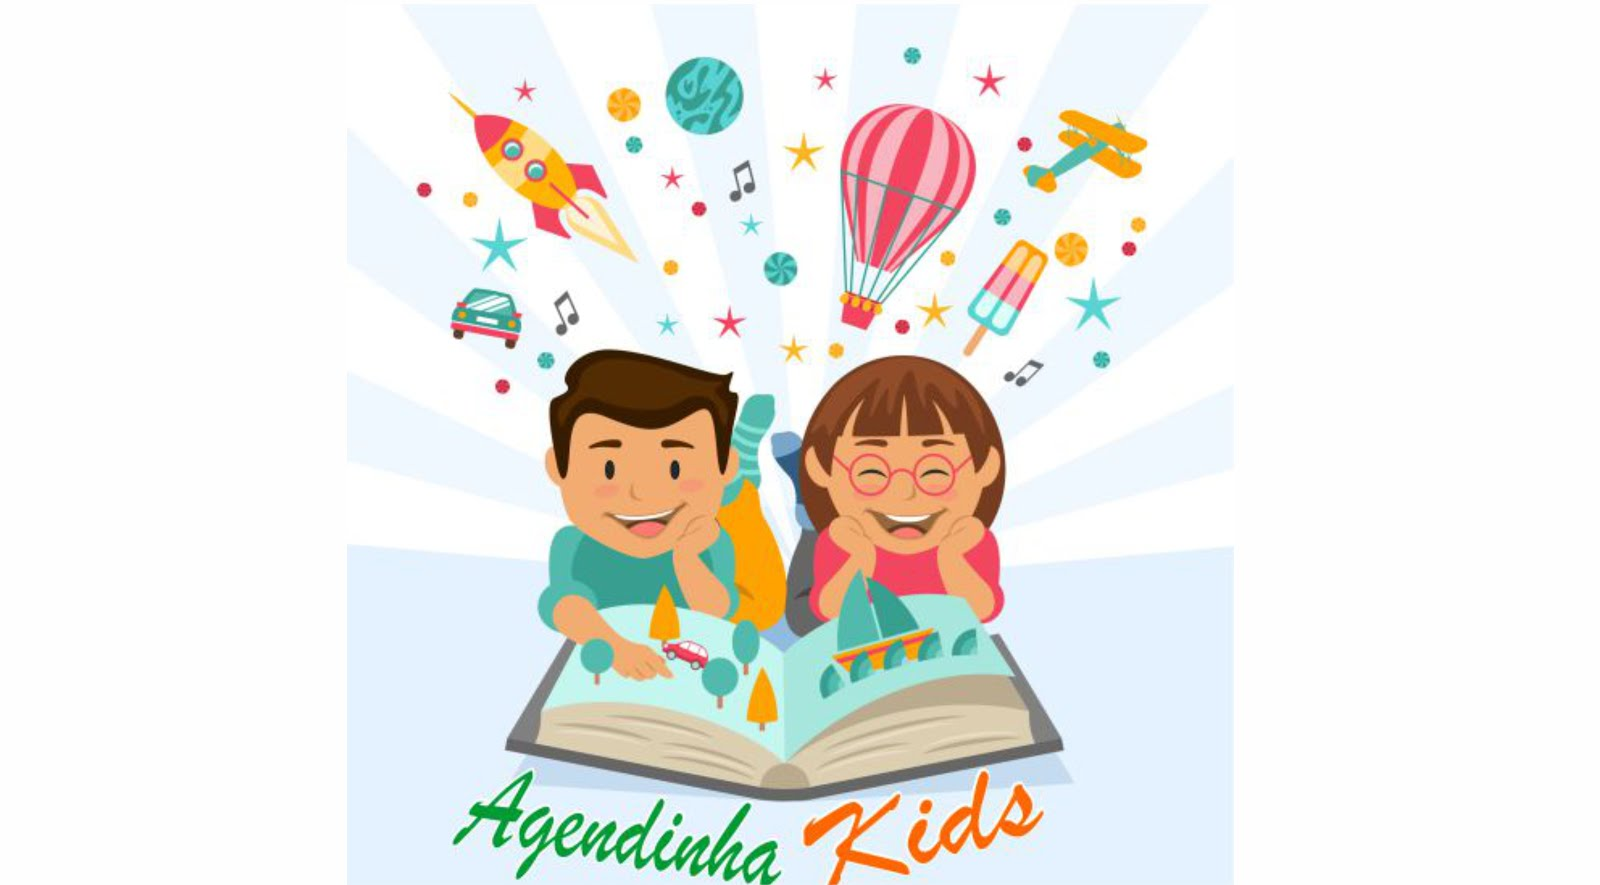 Agendinha Kids